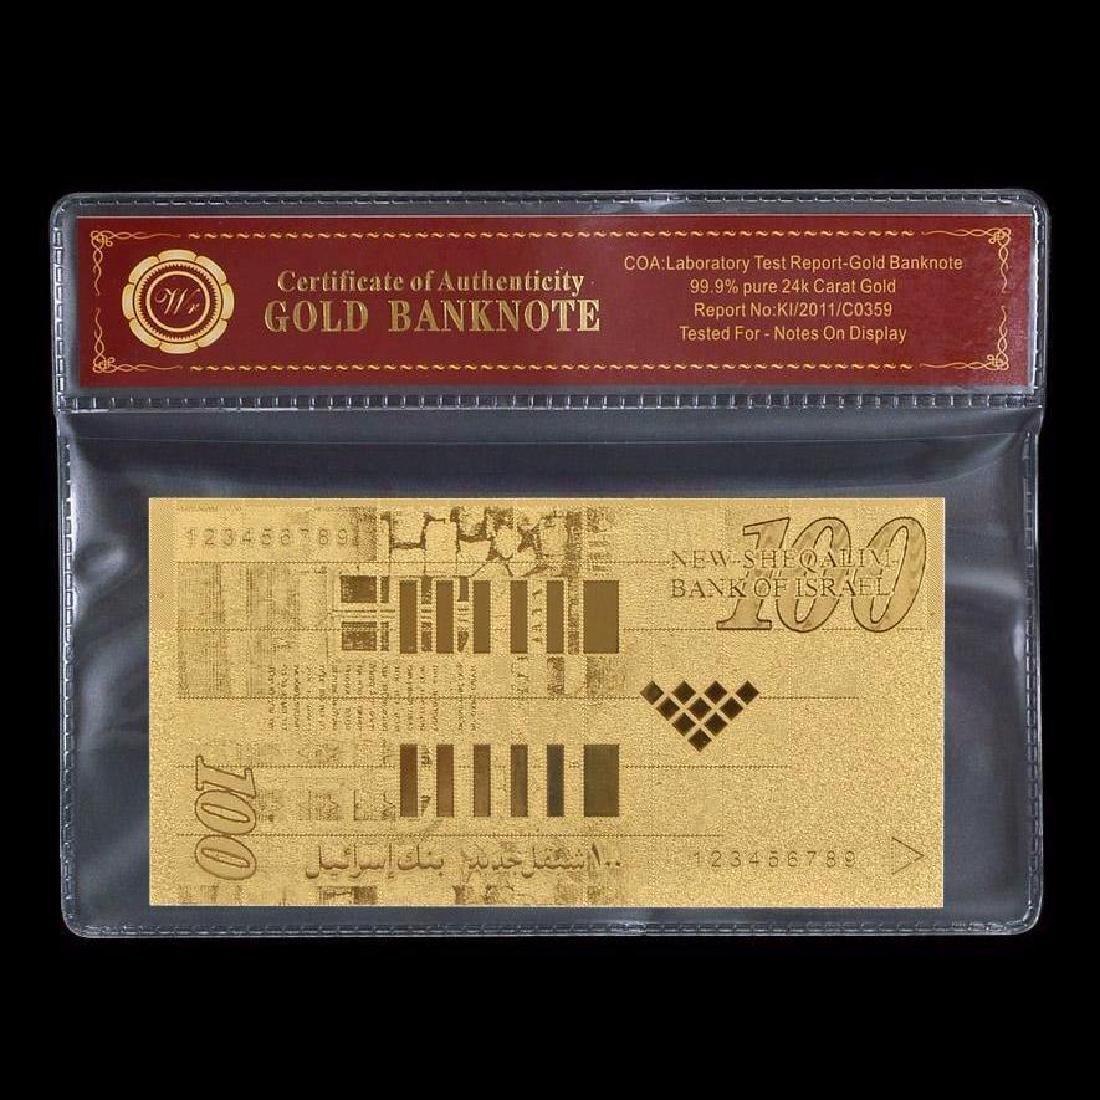 Israel 100 Shekels 24K Gold Clad Banknote - 2